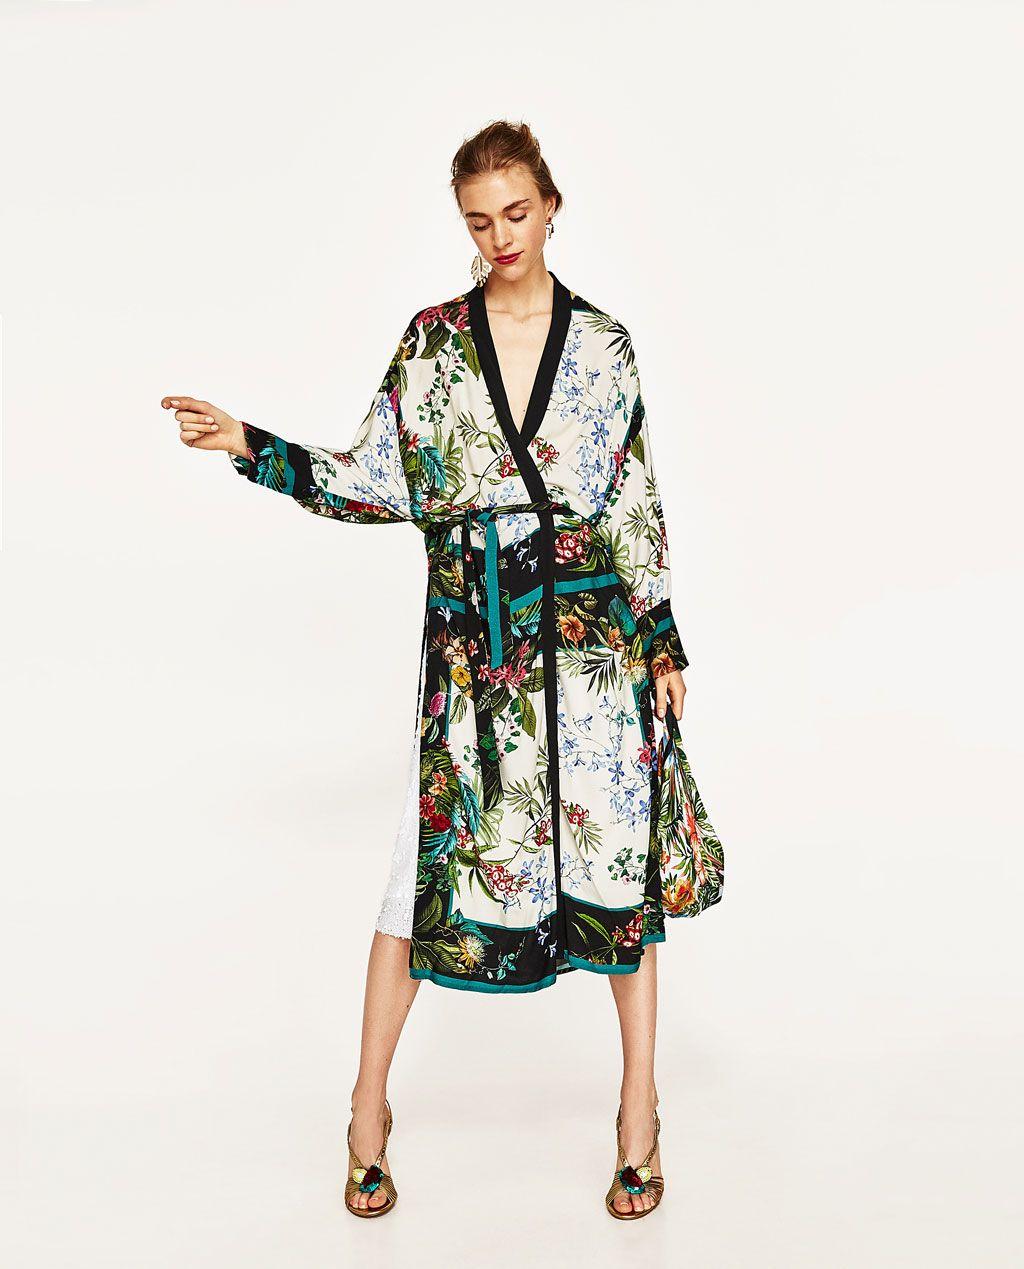 5d2906cdcbd6 ZARA - FEMME - KIMONO LONG IMPRIMÉ Blouse Dress, Women's Kimono Cardigan,  Zara Women